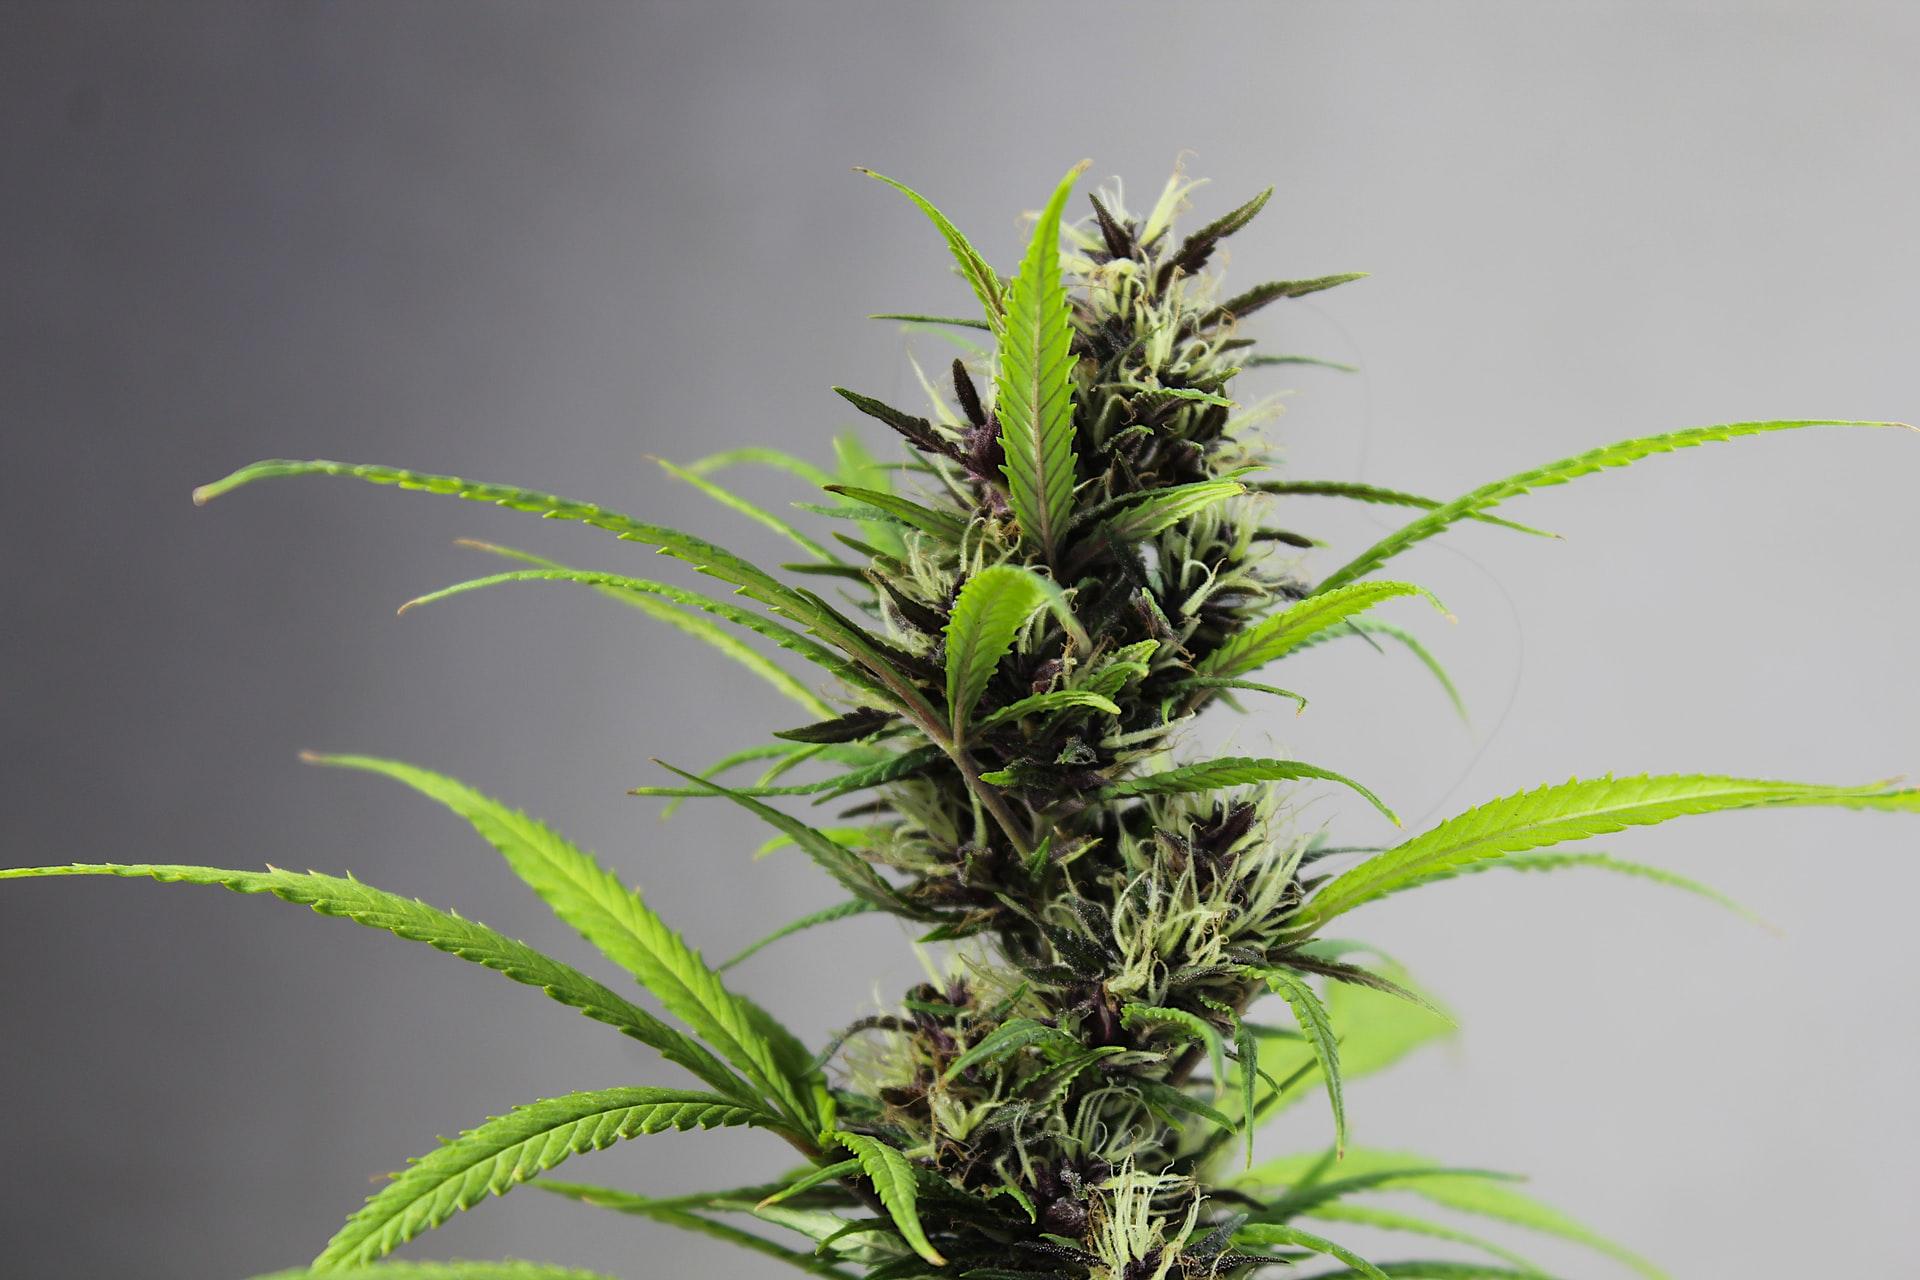 single cannabis plant against purple-grey backdrop